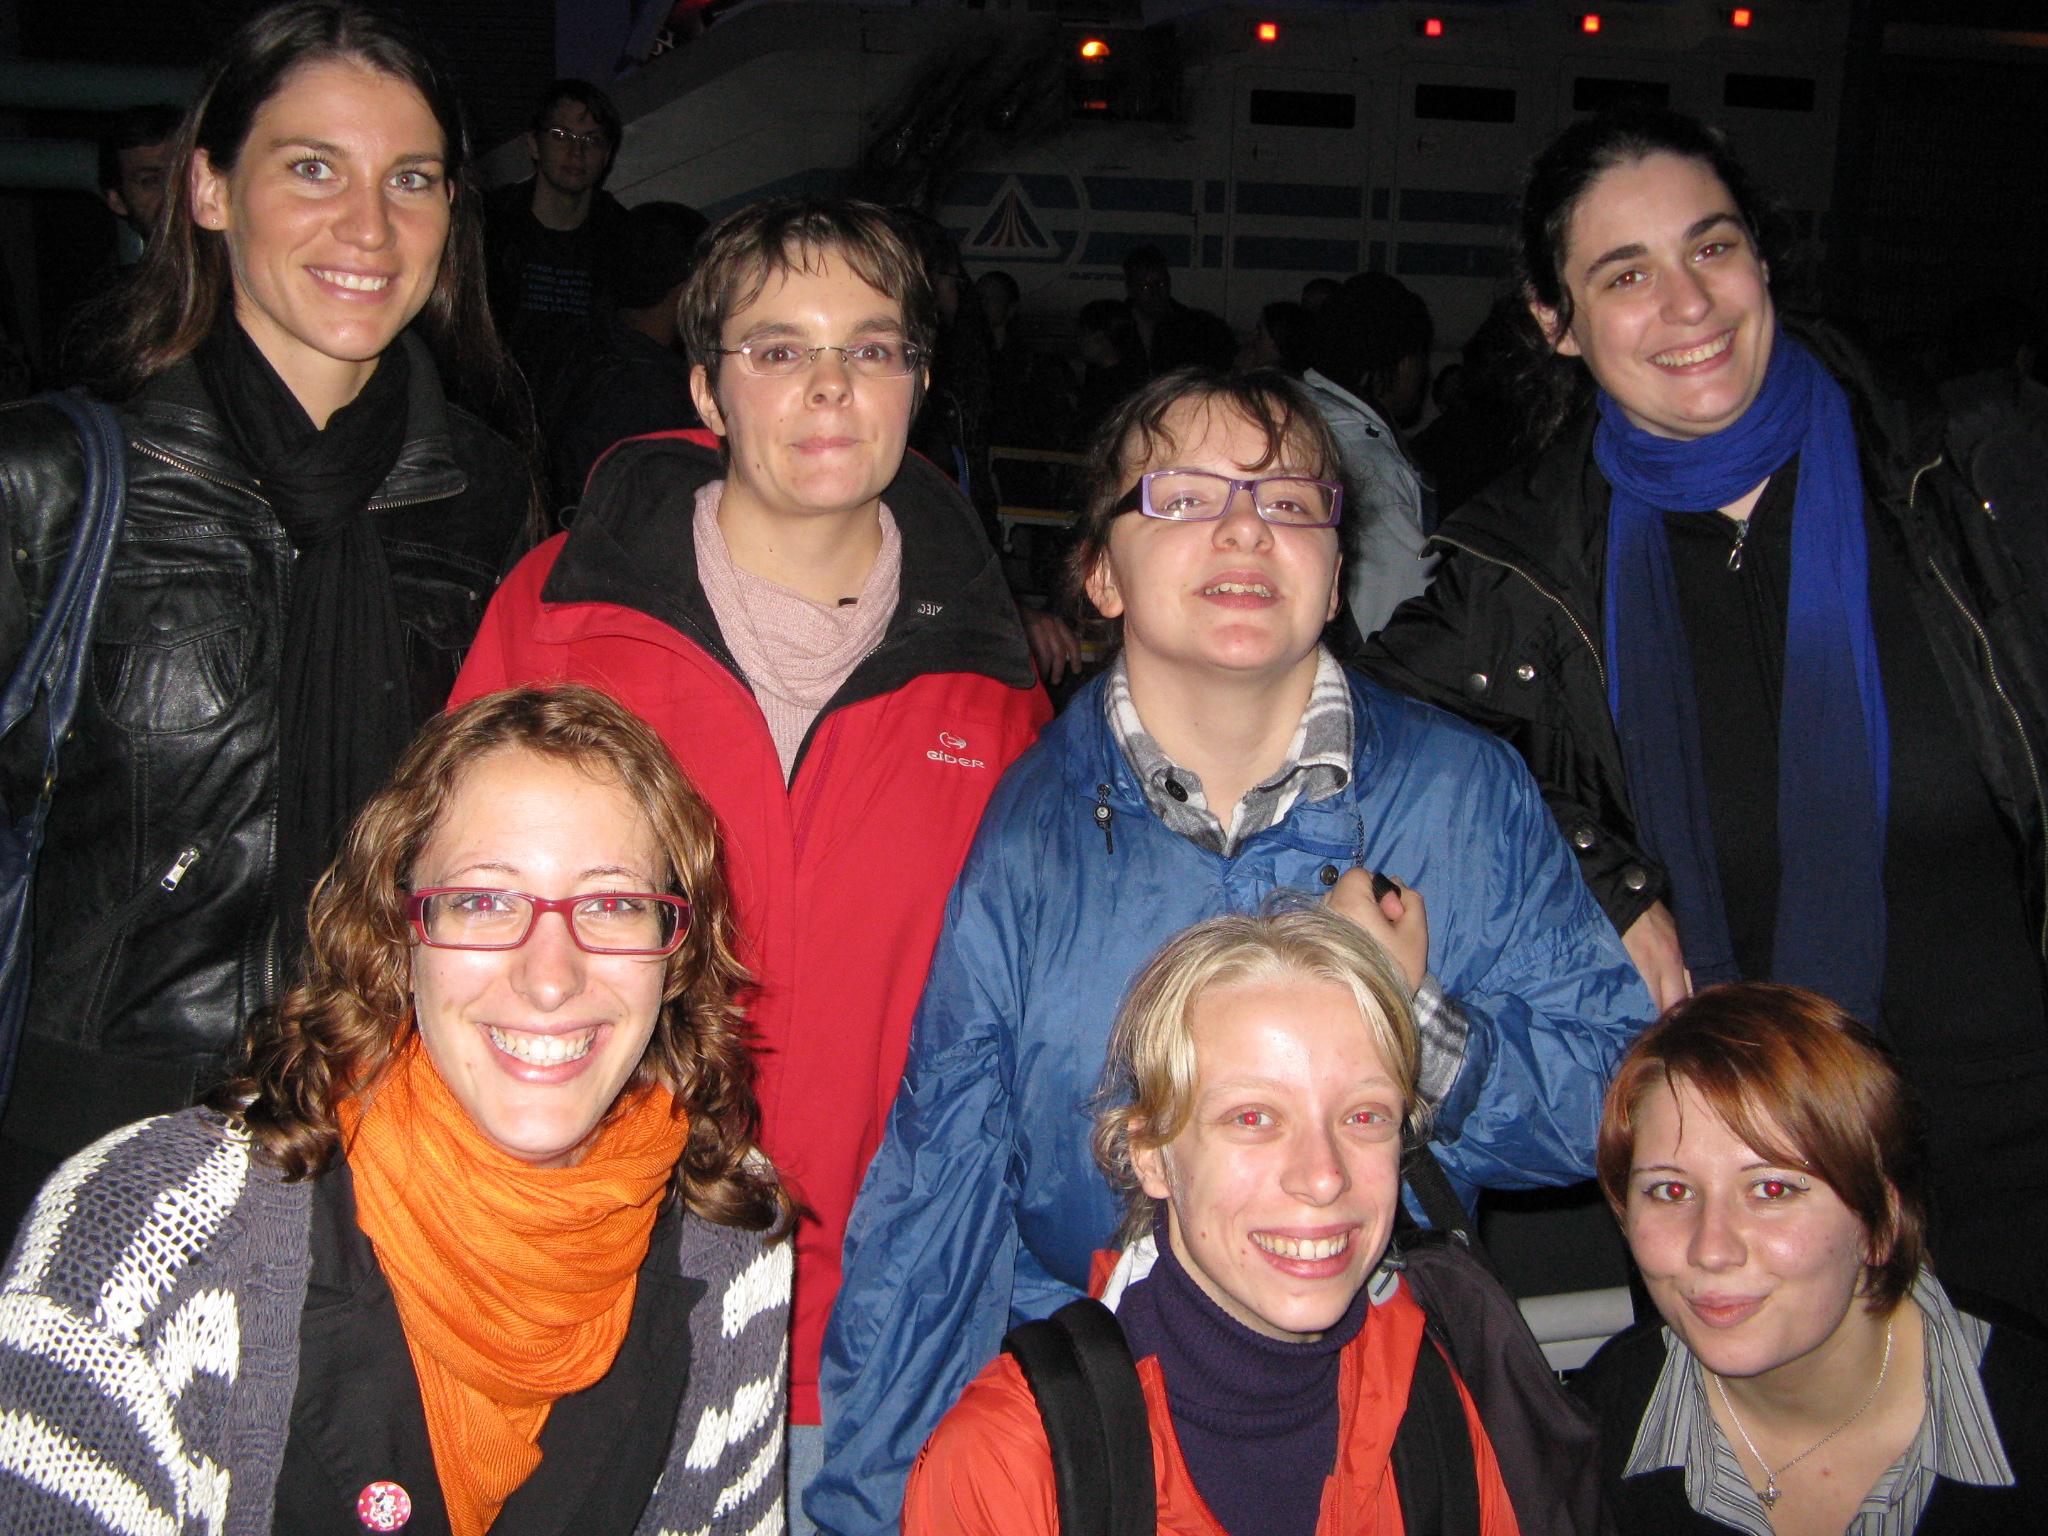 Photo 36 - Camie, maggy, Padmeia, Kenda, geekette, Mara_Jade et AngeSolo